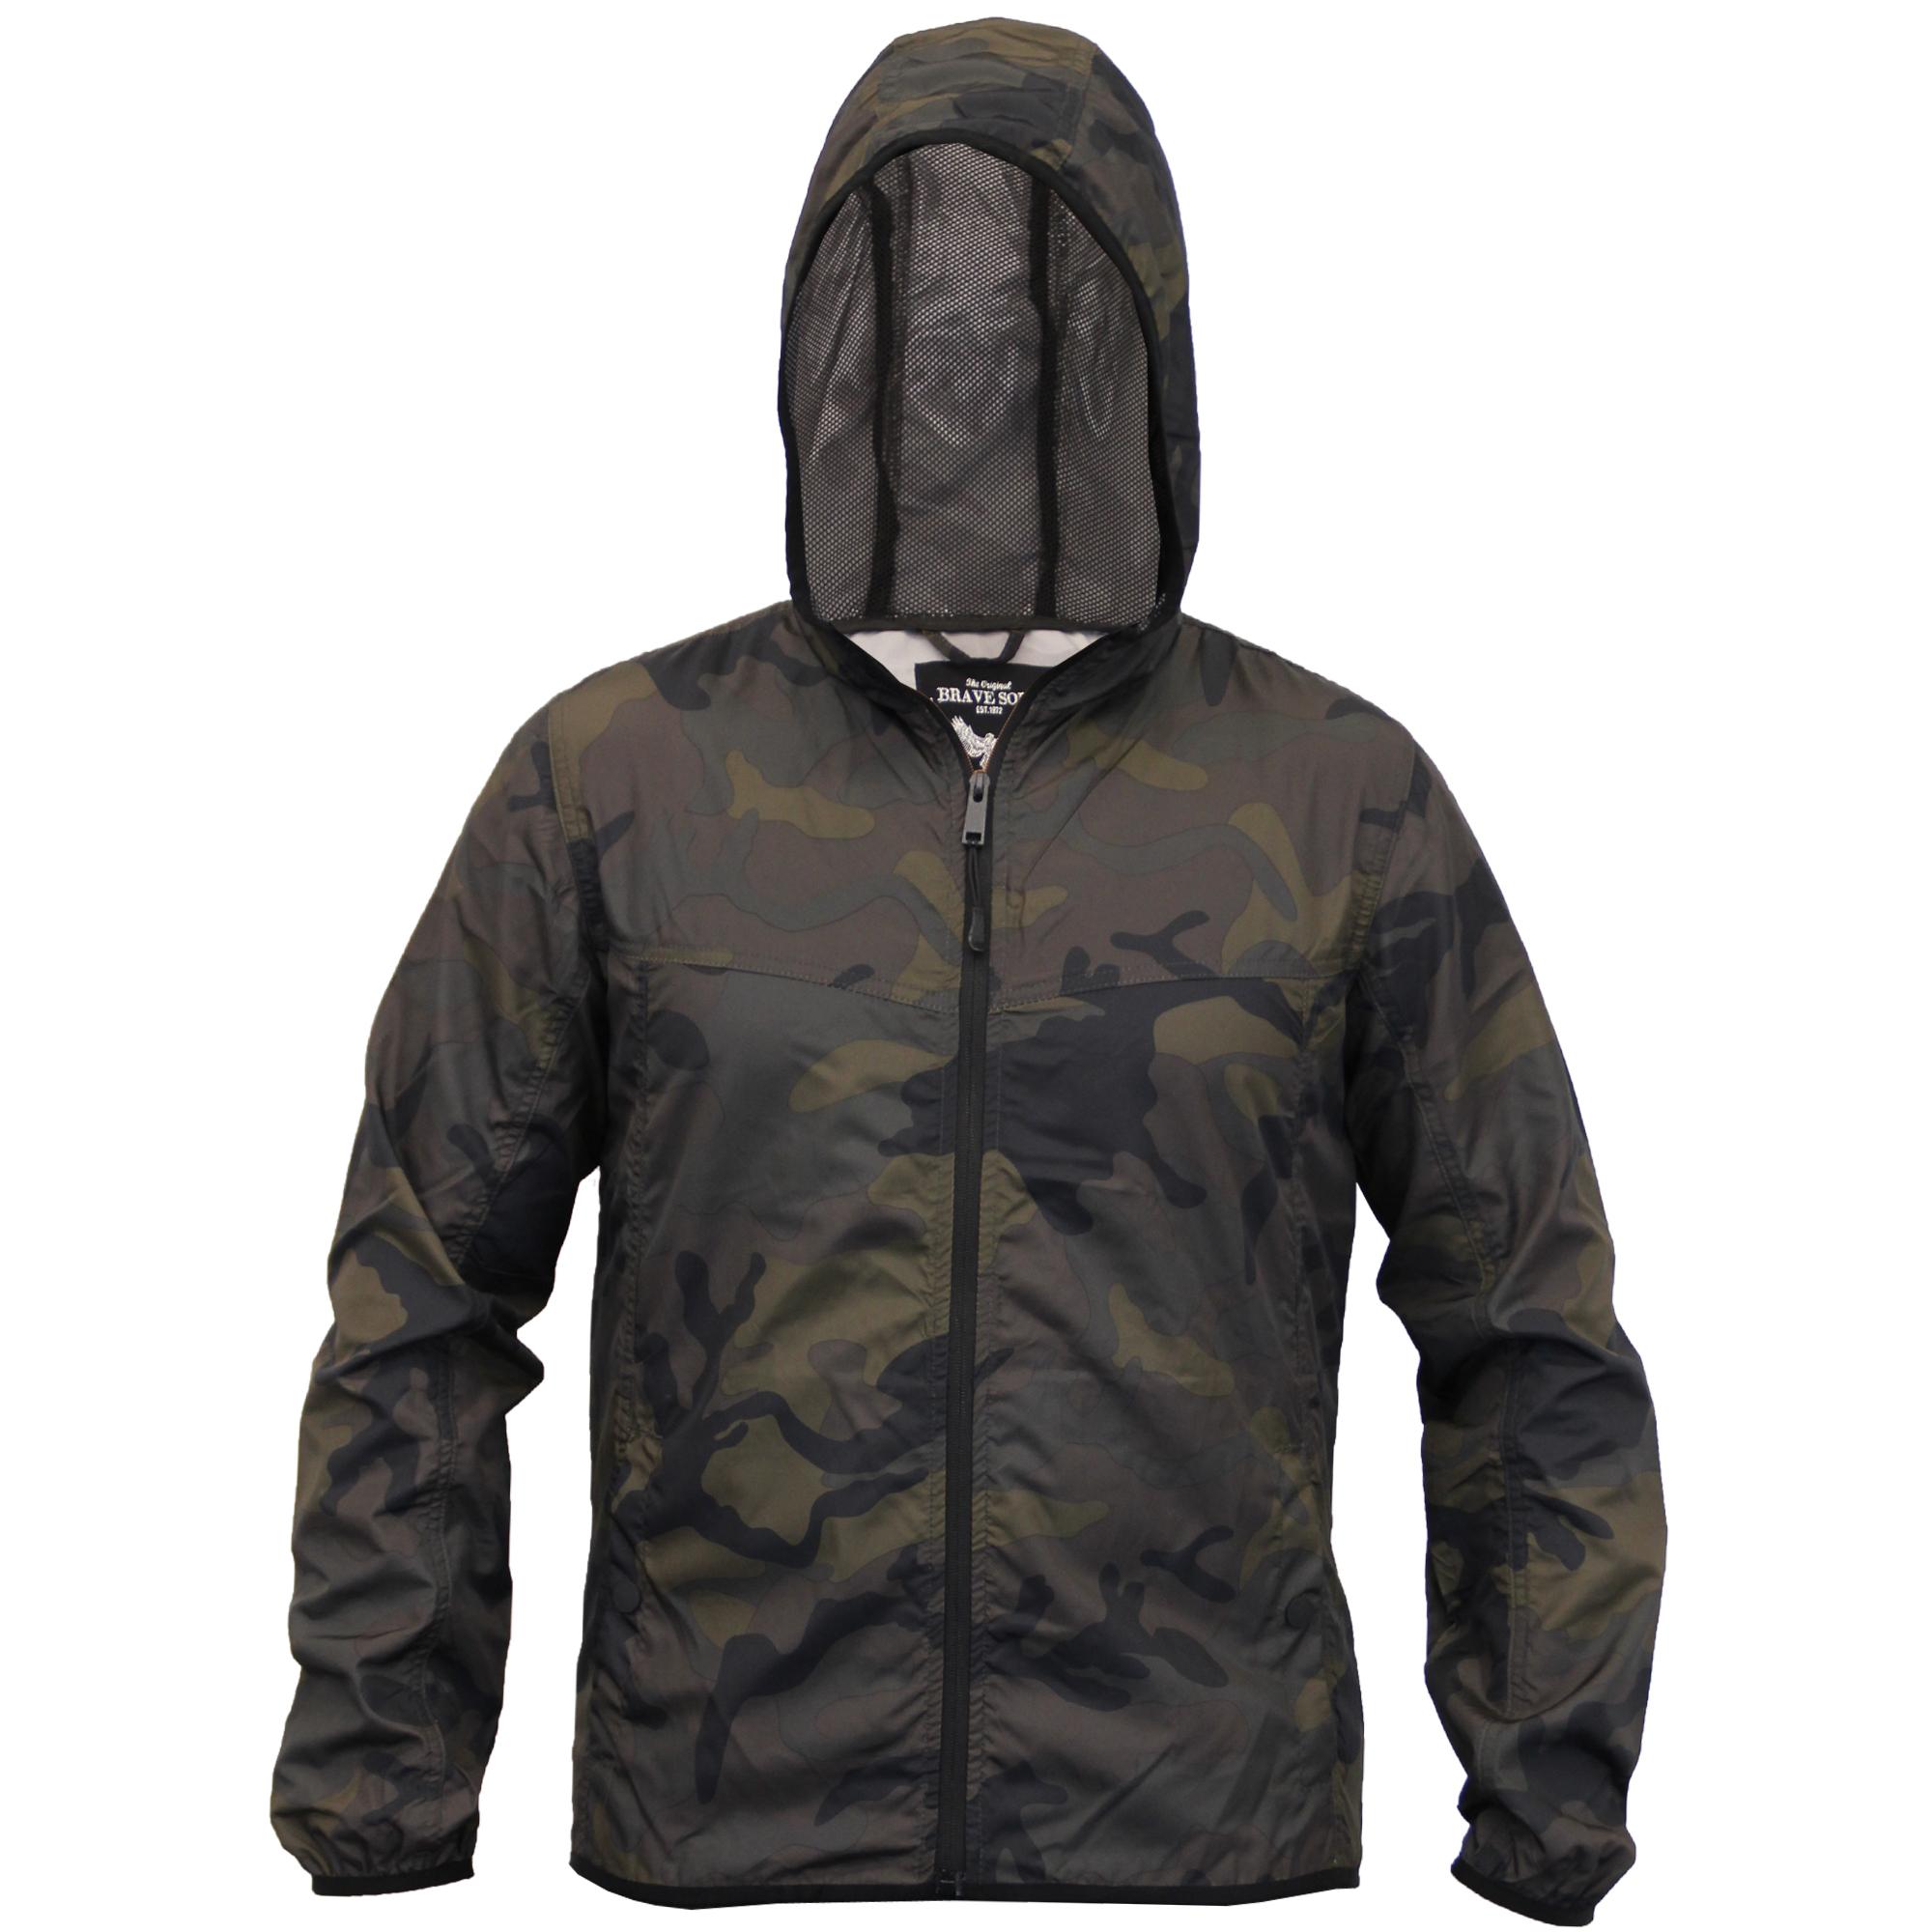 homme camouflage veste brave soul kagool manteau militaire capuche coupe vent maille neuf ebay. Black Bedroom Furniture Sets. Home Design Ideas